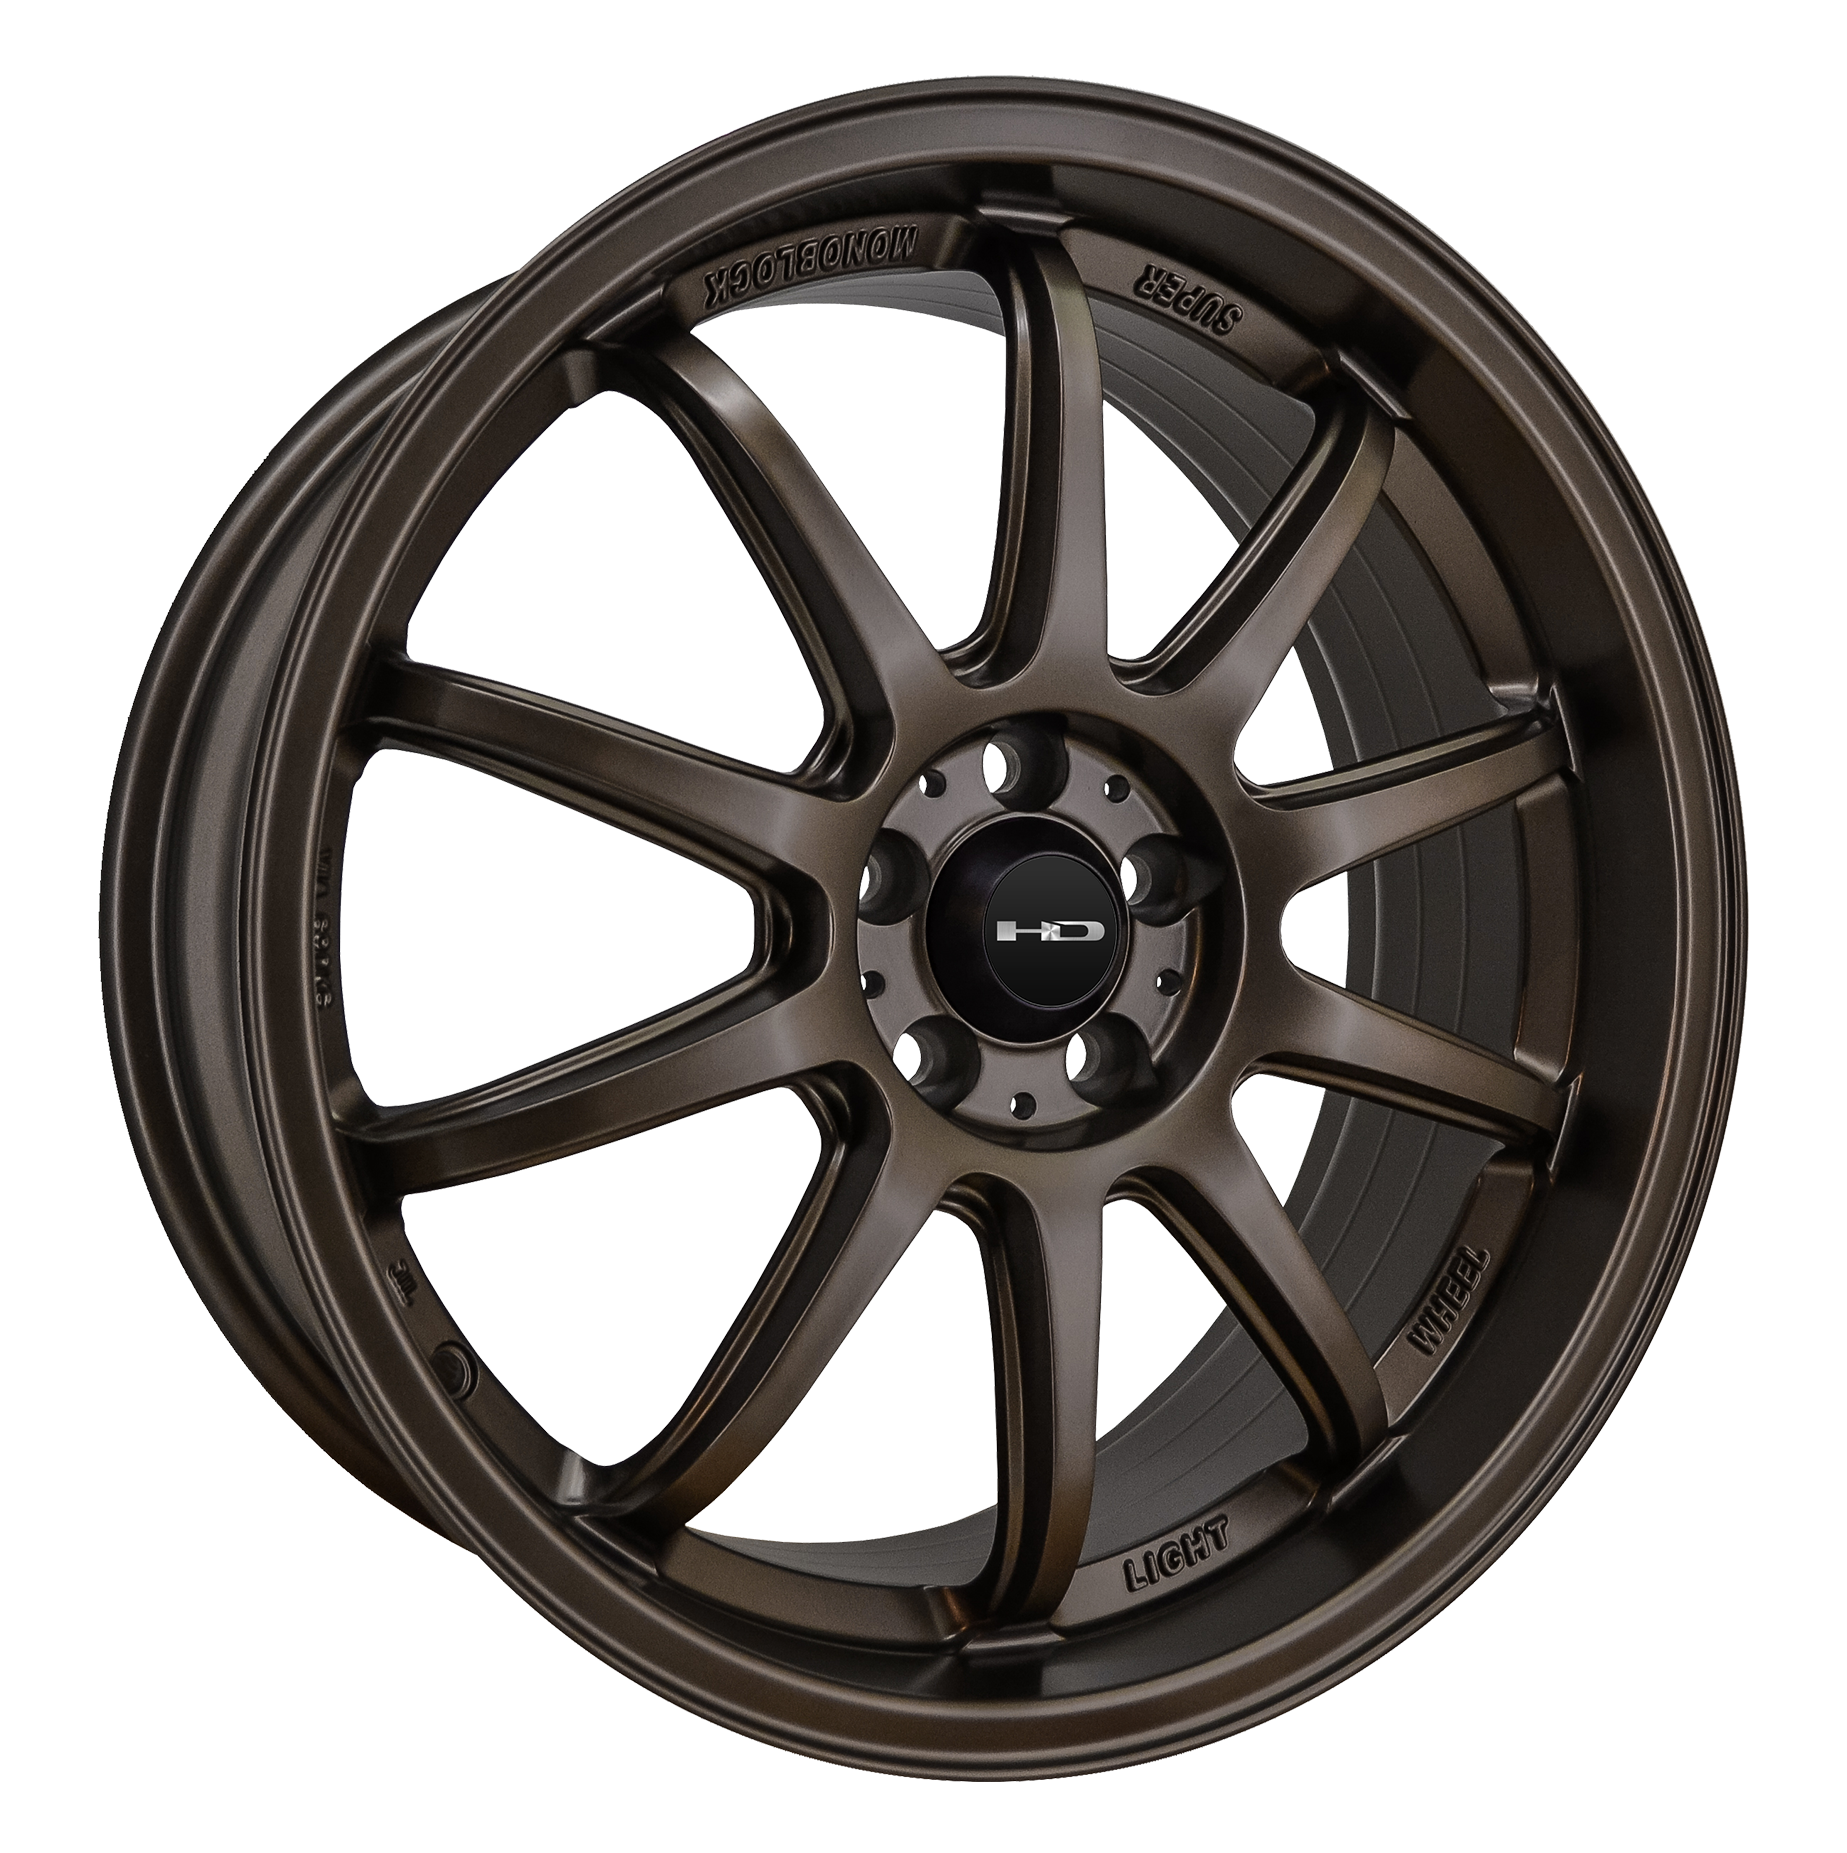 HD Wheels - Clutch; HD Wheels Clutch Satin Bronze PlusPng.com  - Wheel HD PNG